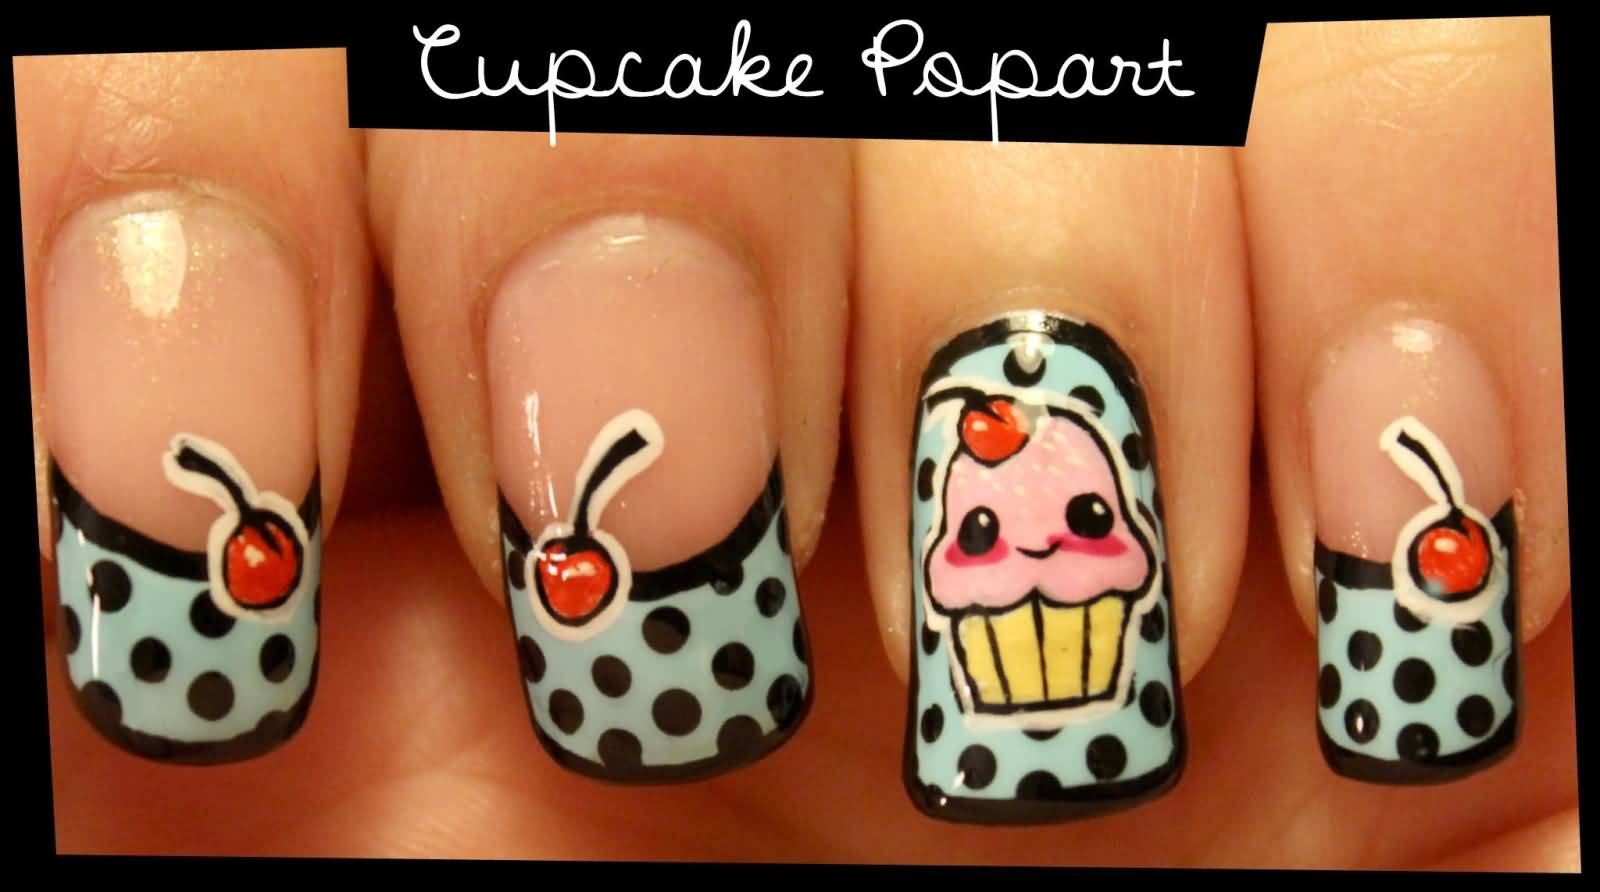 Cupcake Nail Art Design : 51 Wonderful Cupcake Nail Art Design Ideas For Girls